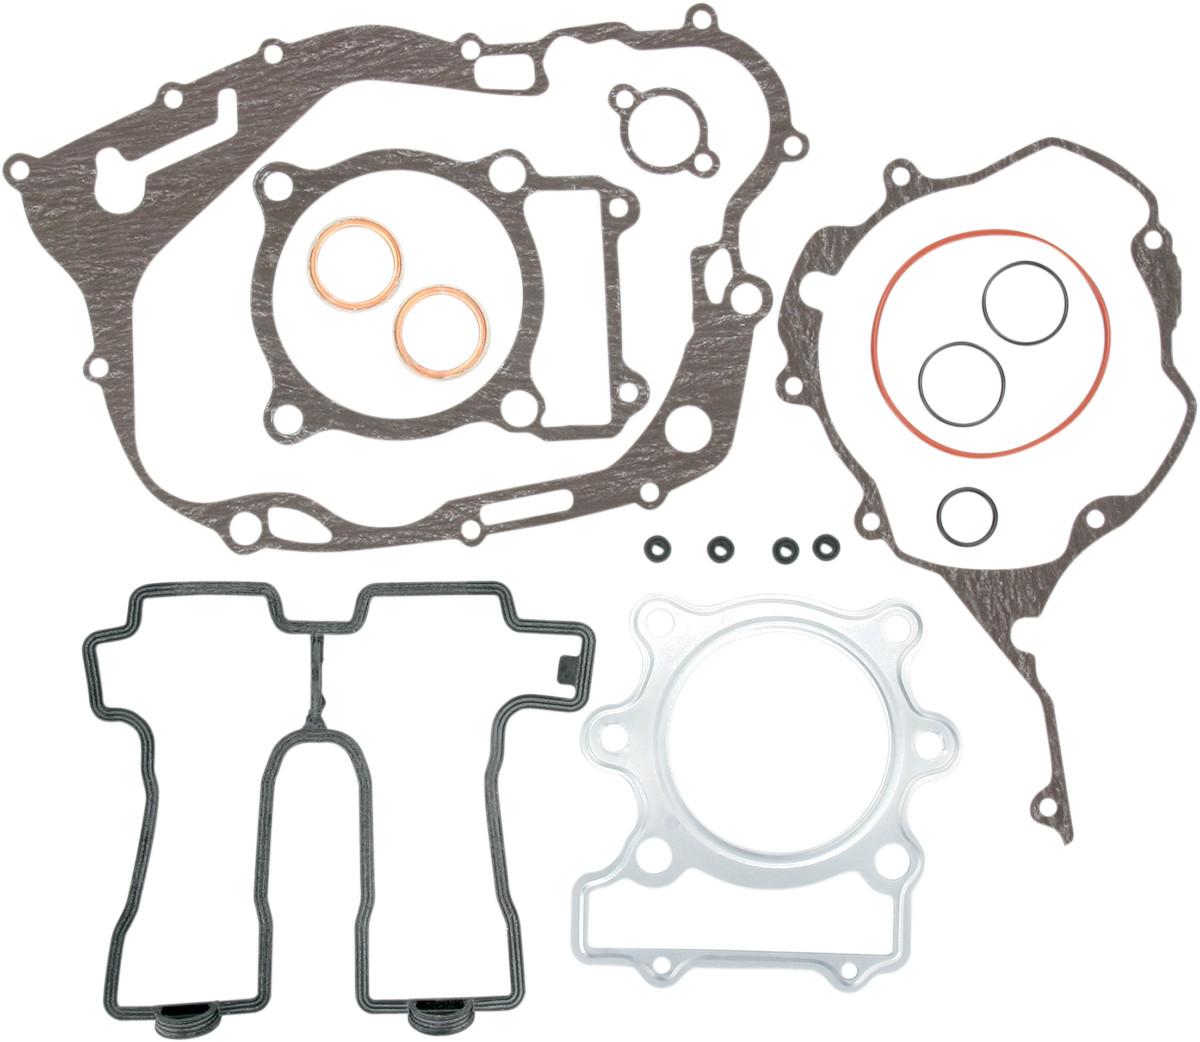 Vesrah Complete Engine Gasket Kit For Yamaha Xt 350 85 92